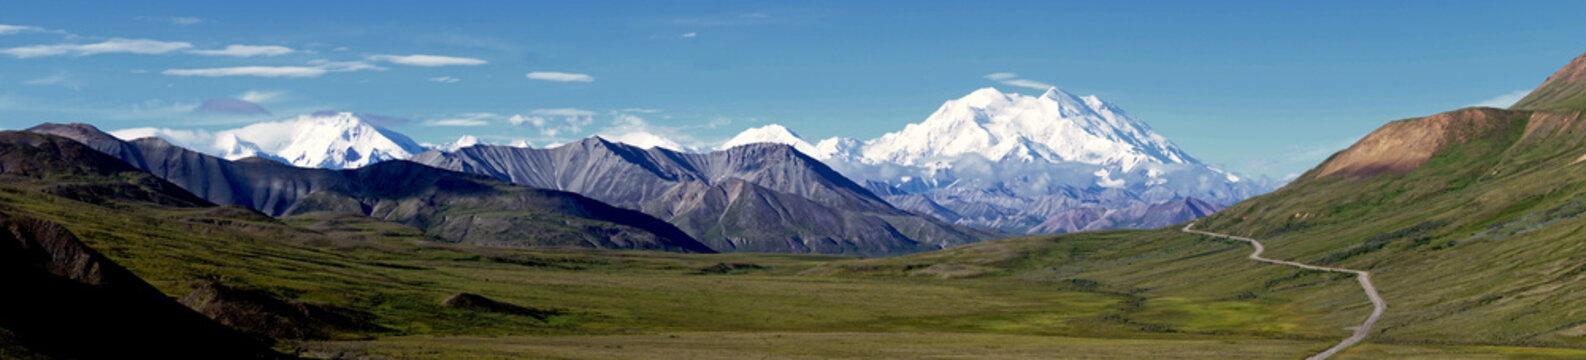 Panorama of Mt Denali, Denali National Park, Alaska